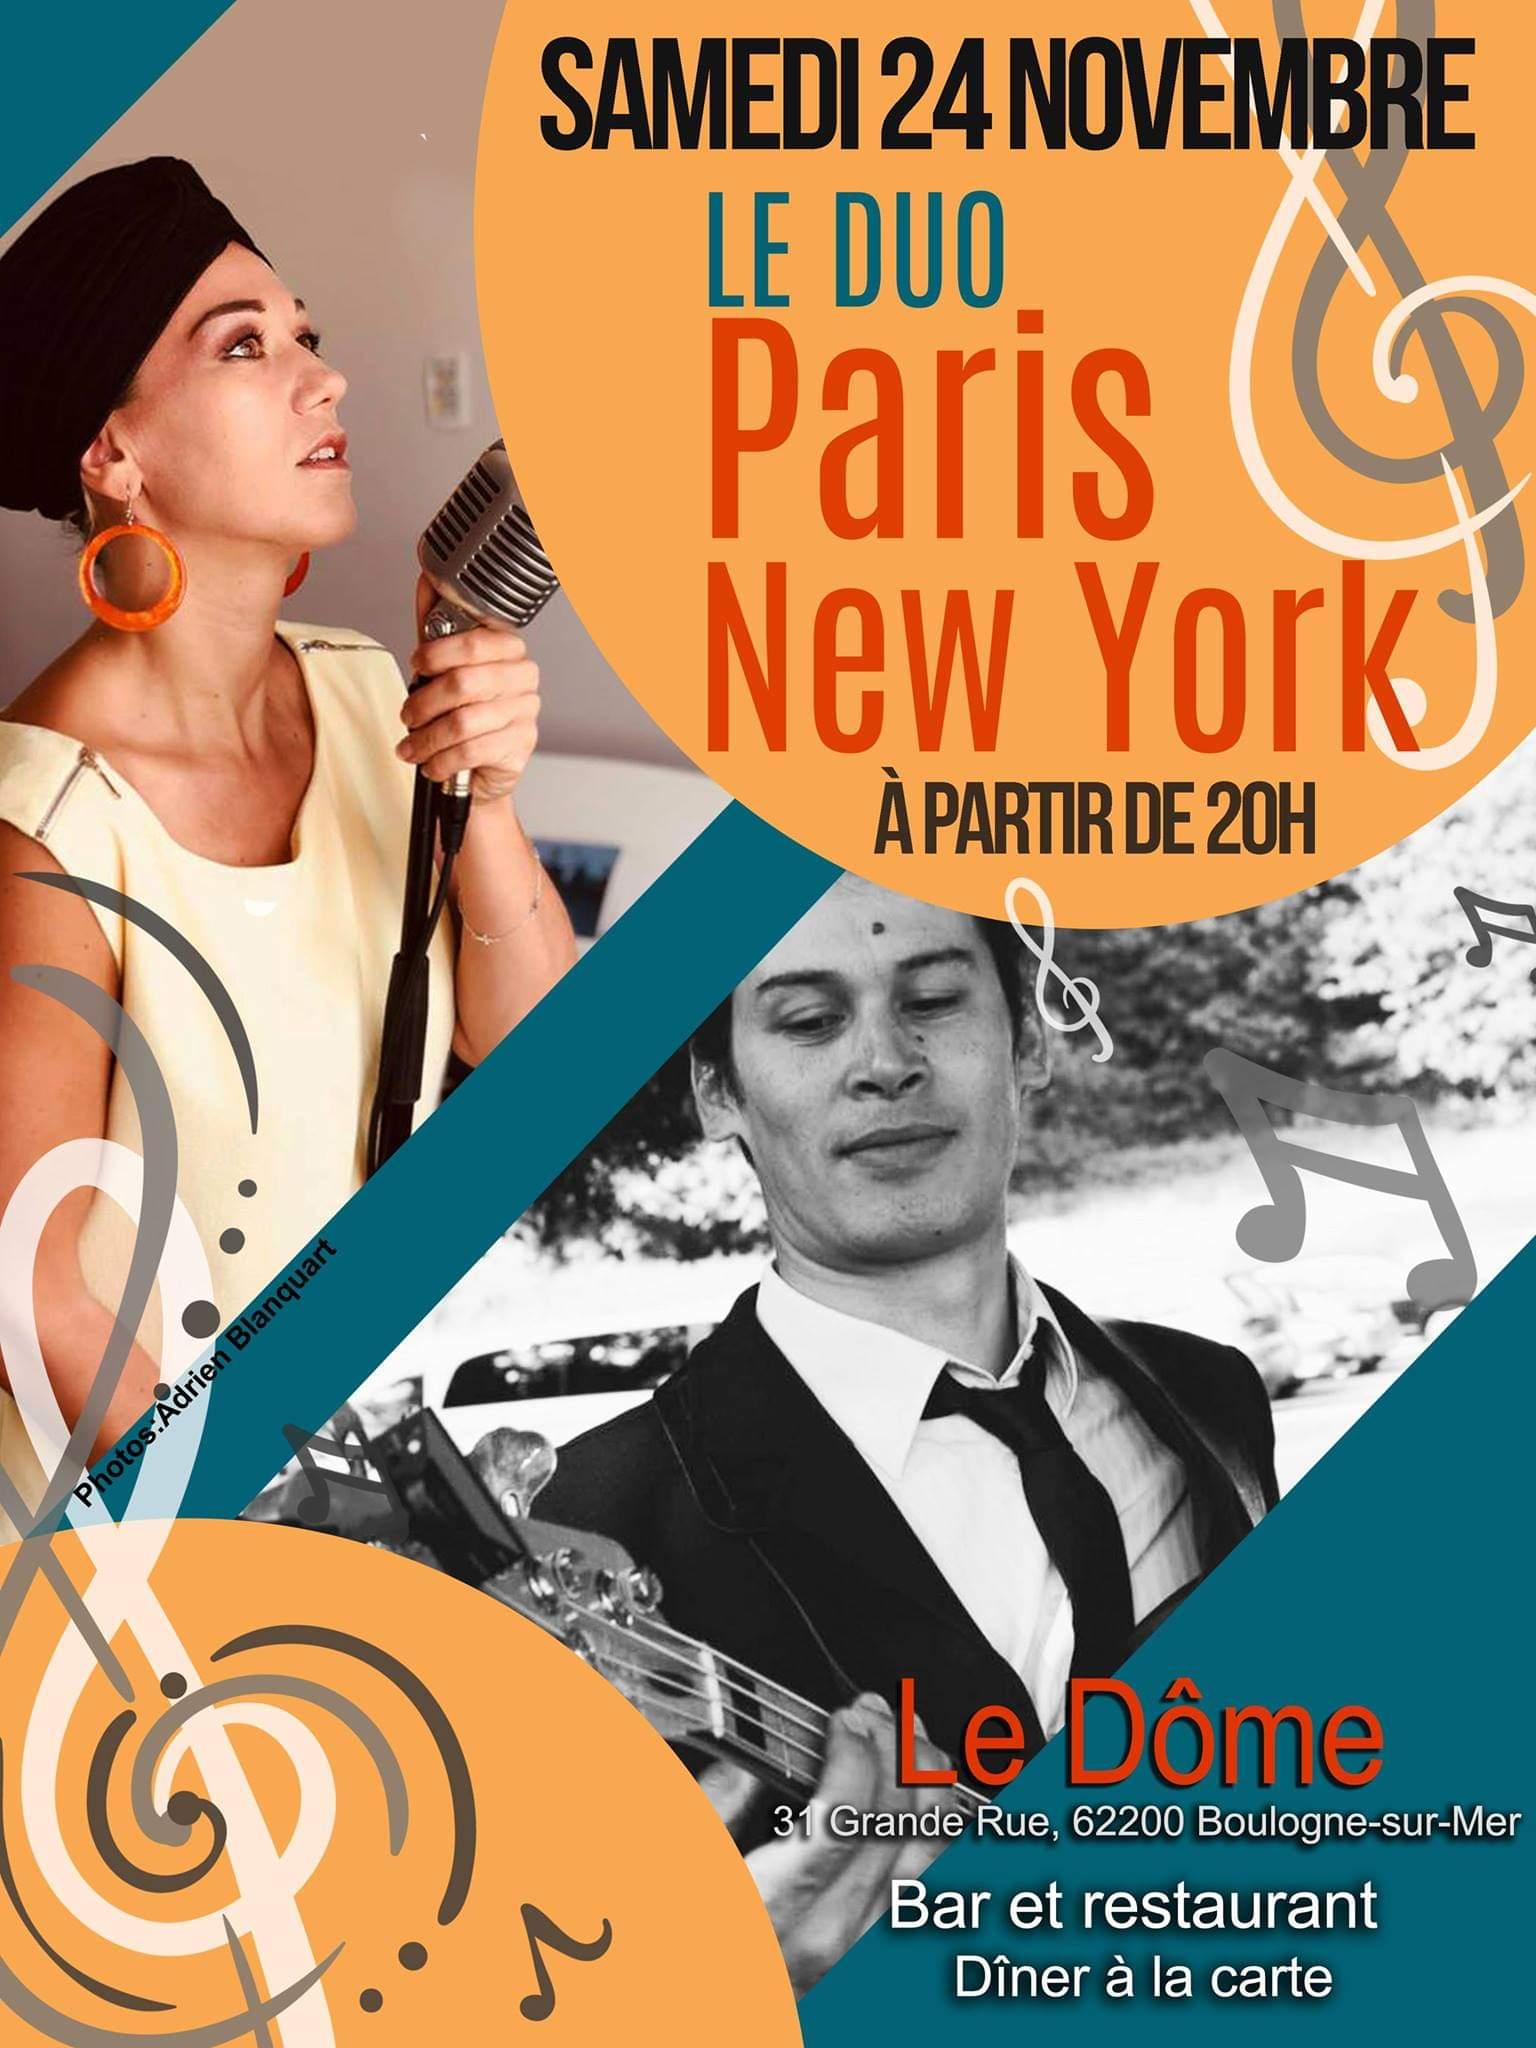 Duo Paris New York Samedi 24  Novembre 2018